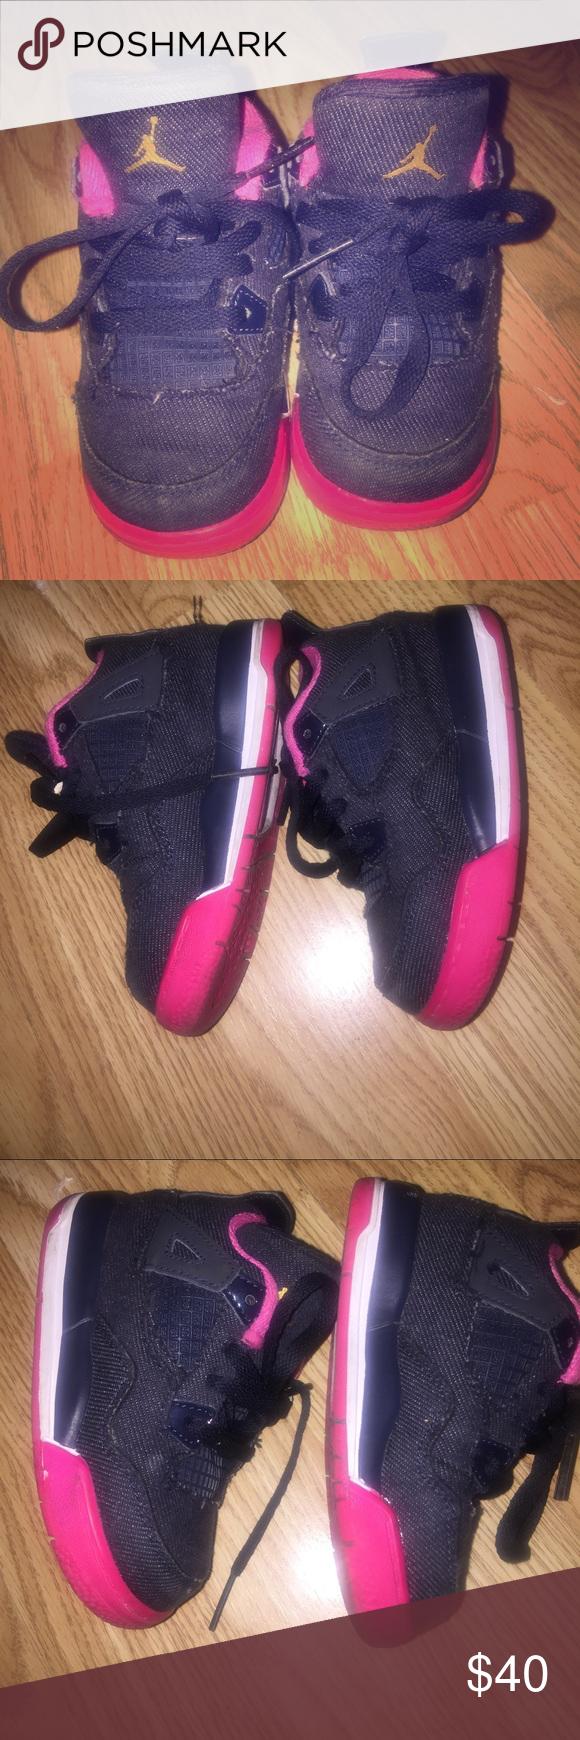 jordan girls shoes 7c